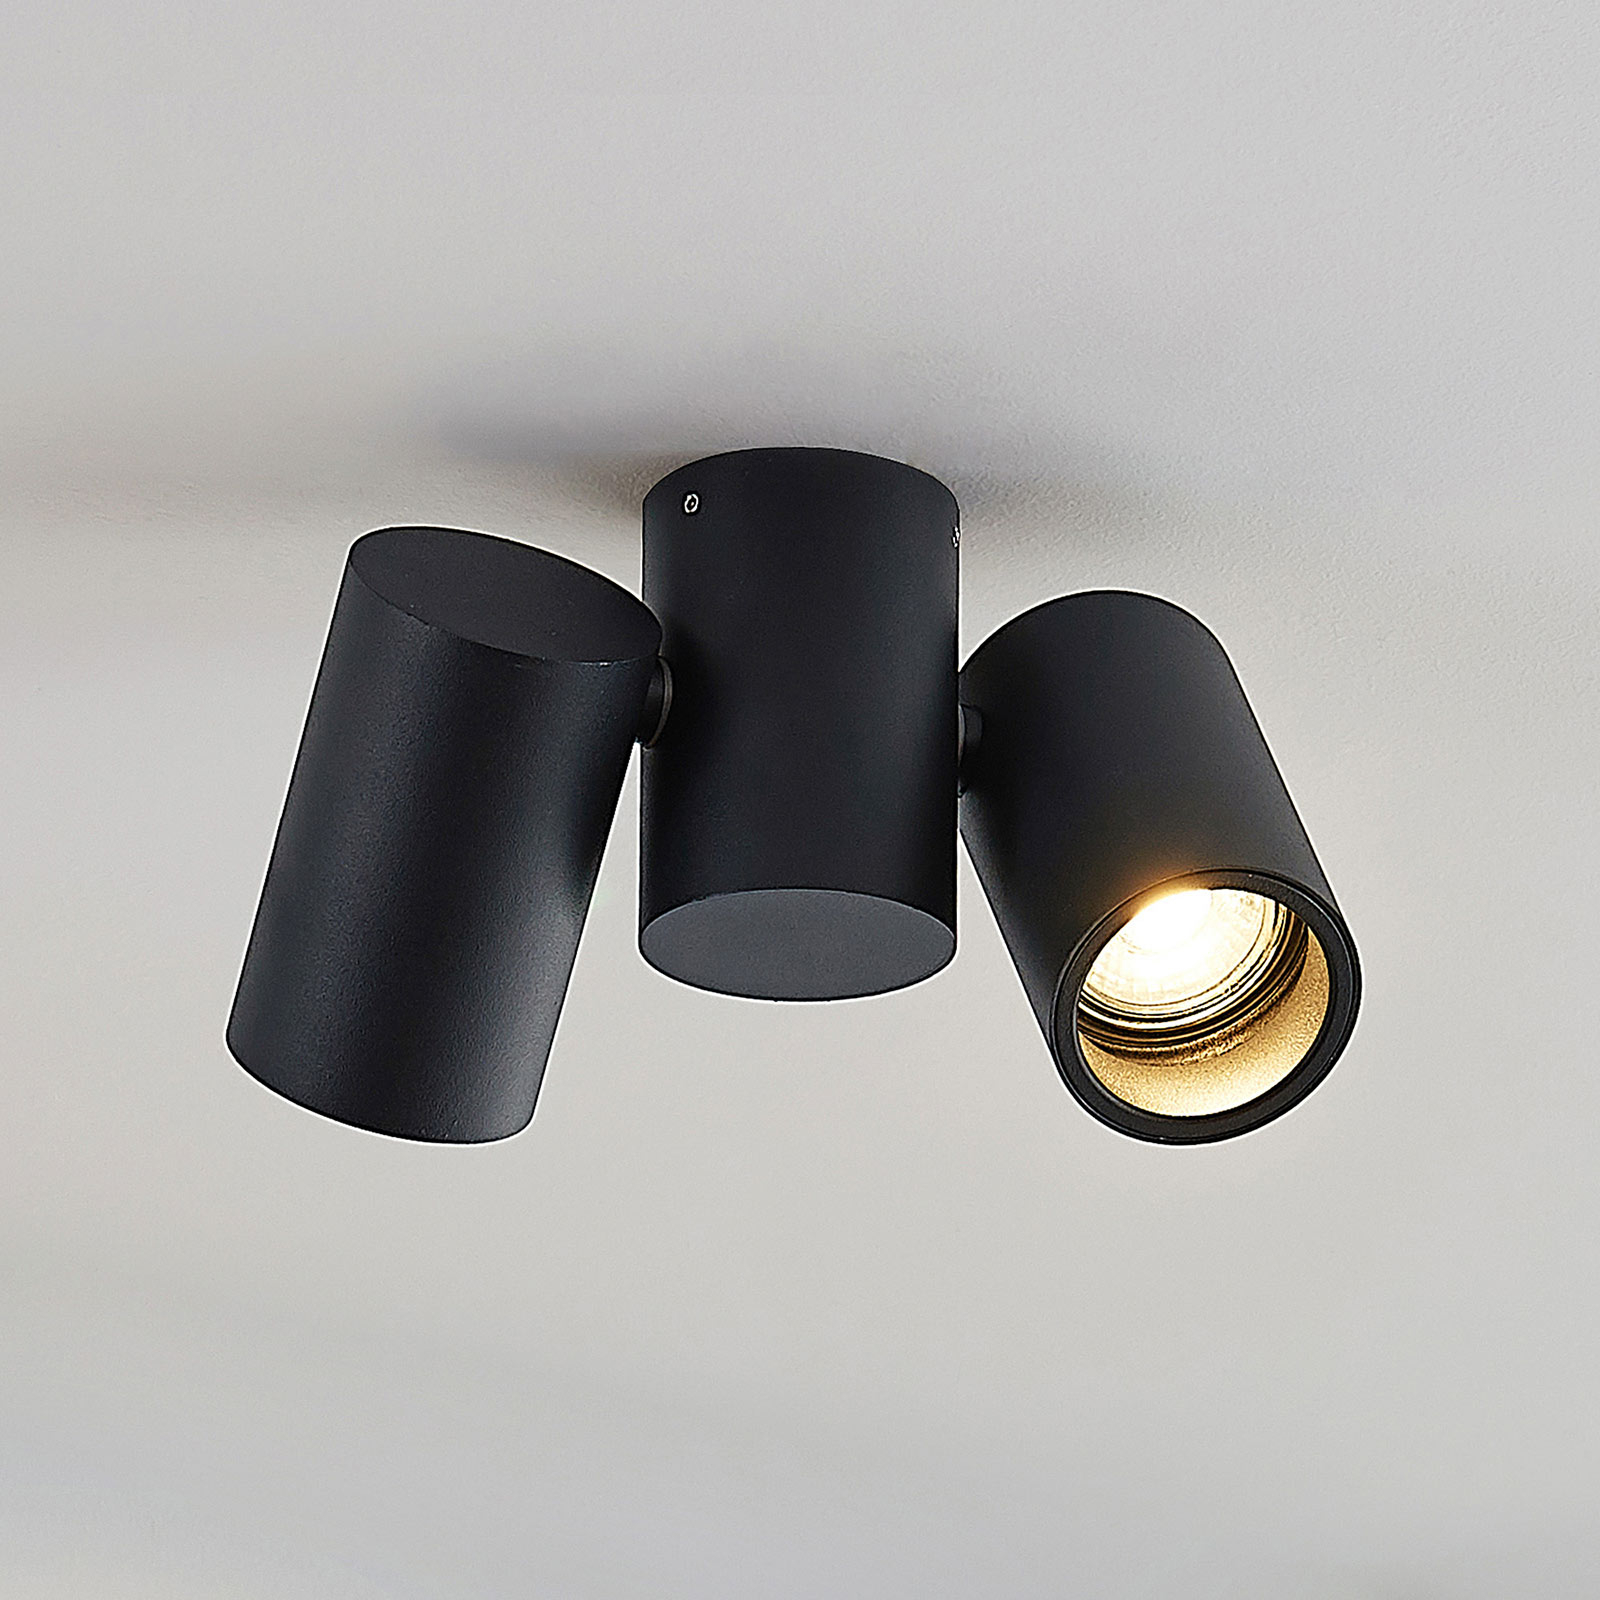 Taklampe Gesina, 2 lyskilder, svart